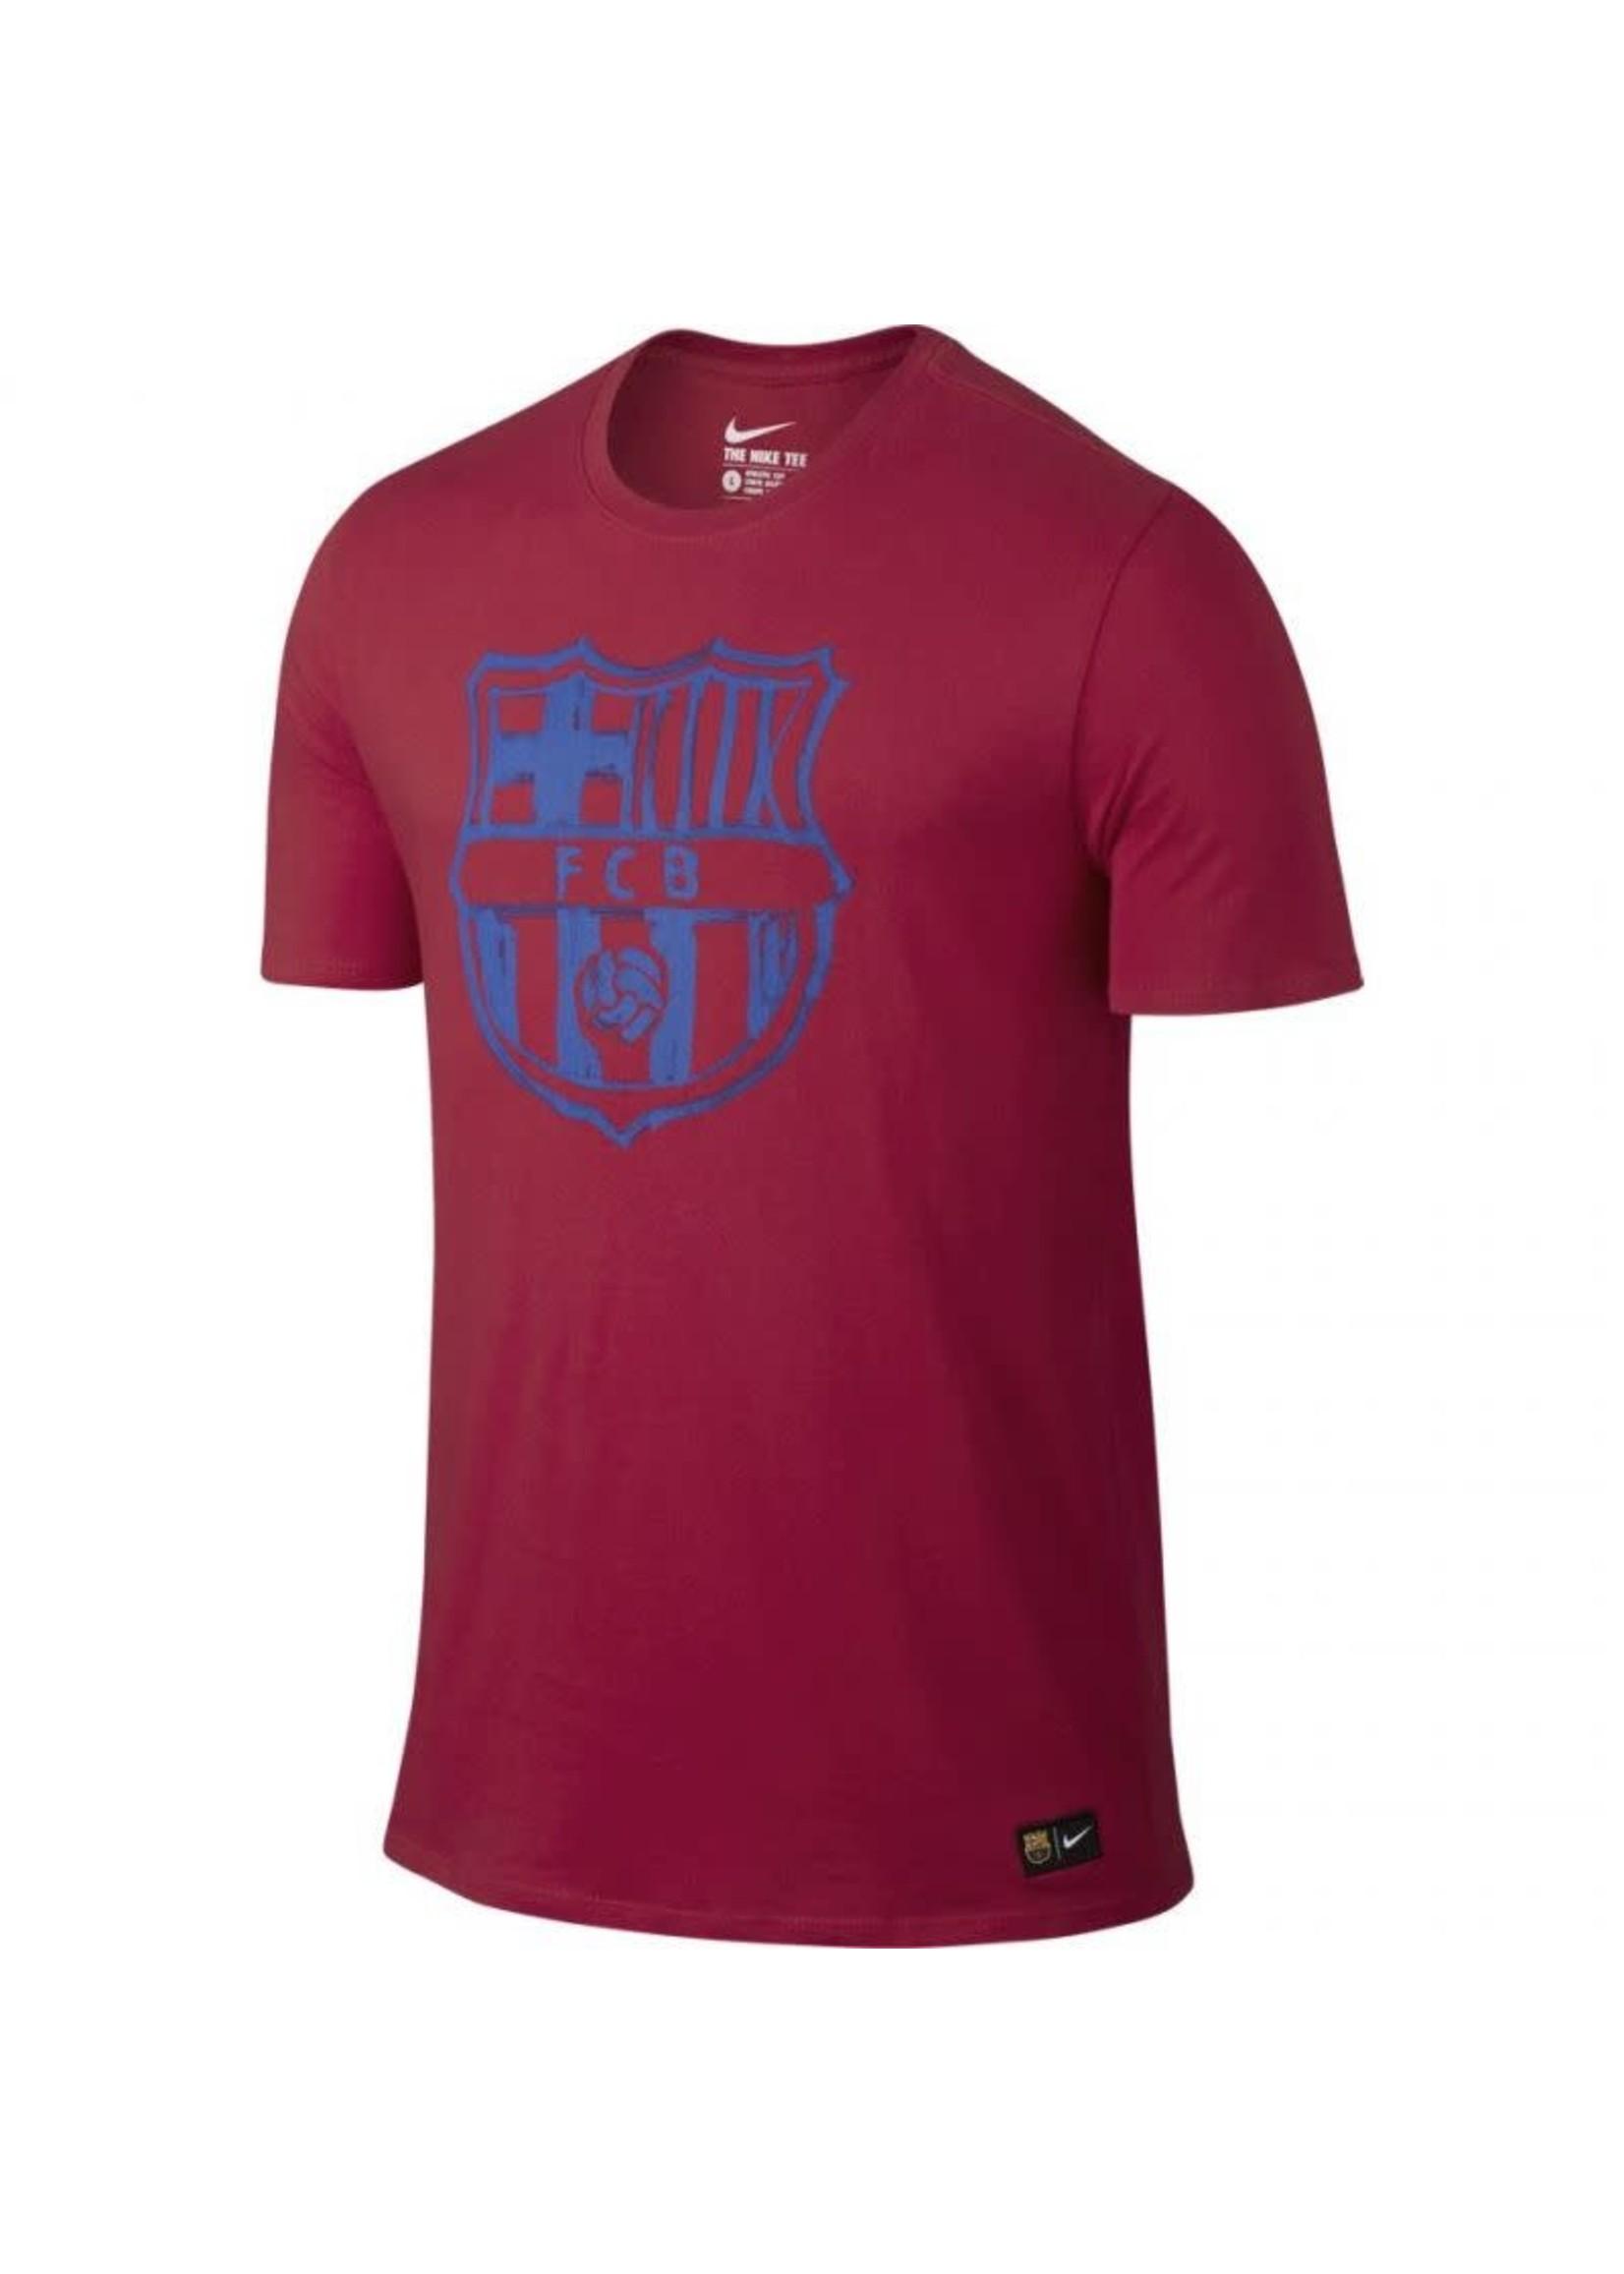 Nike Barcelona T-Shirt - Red/Blue